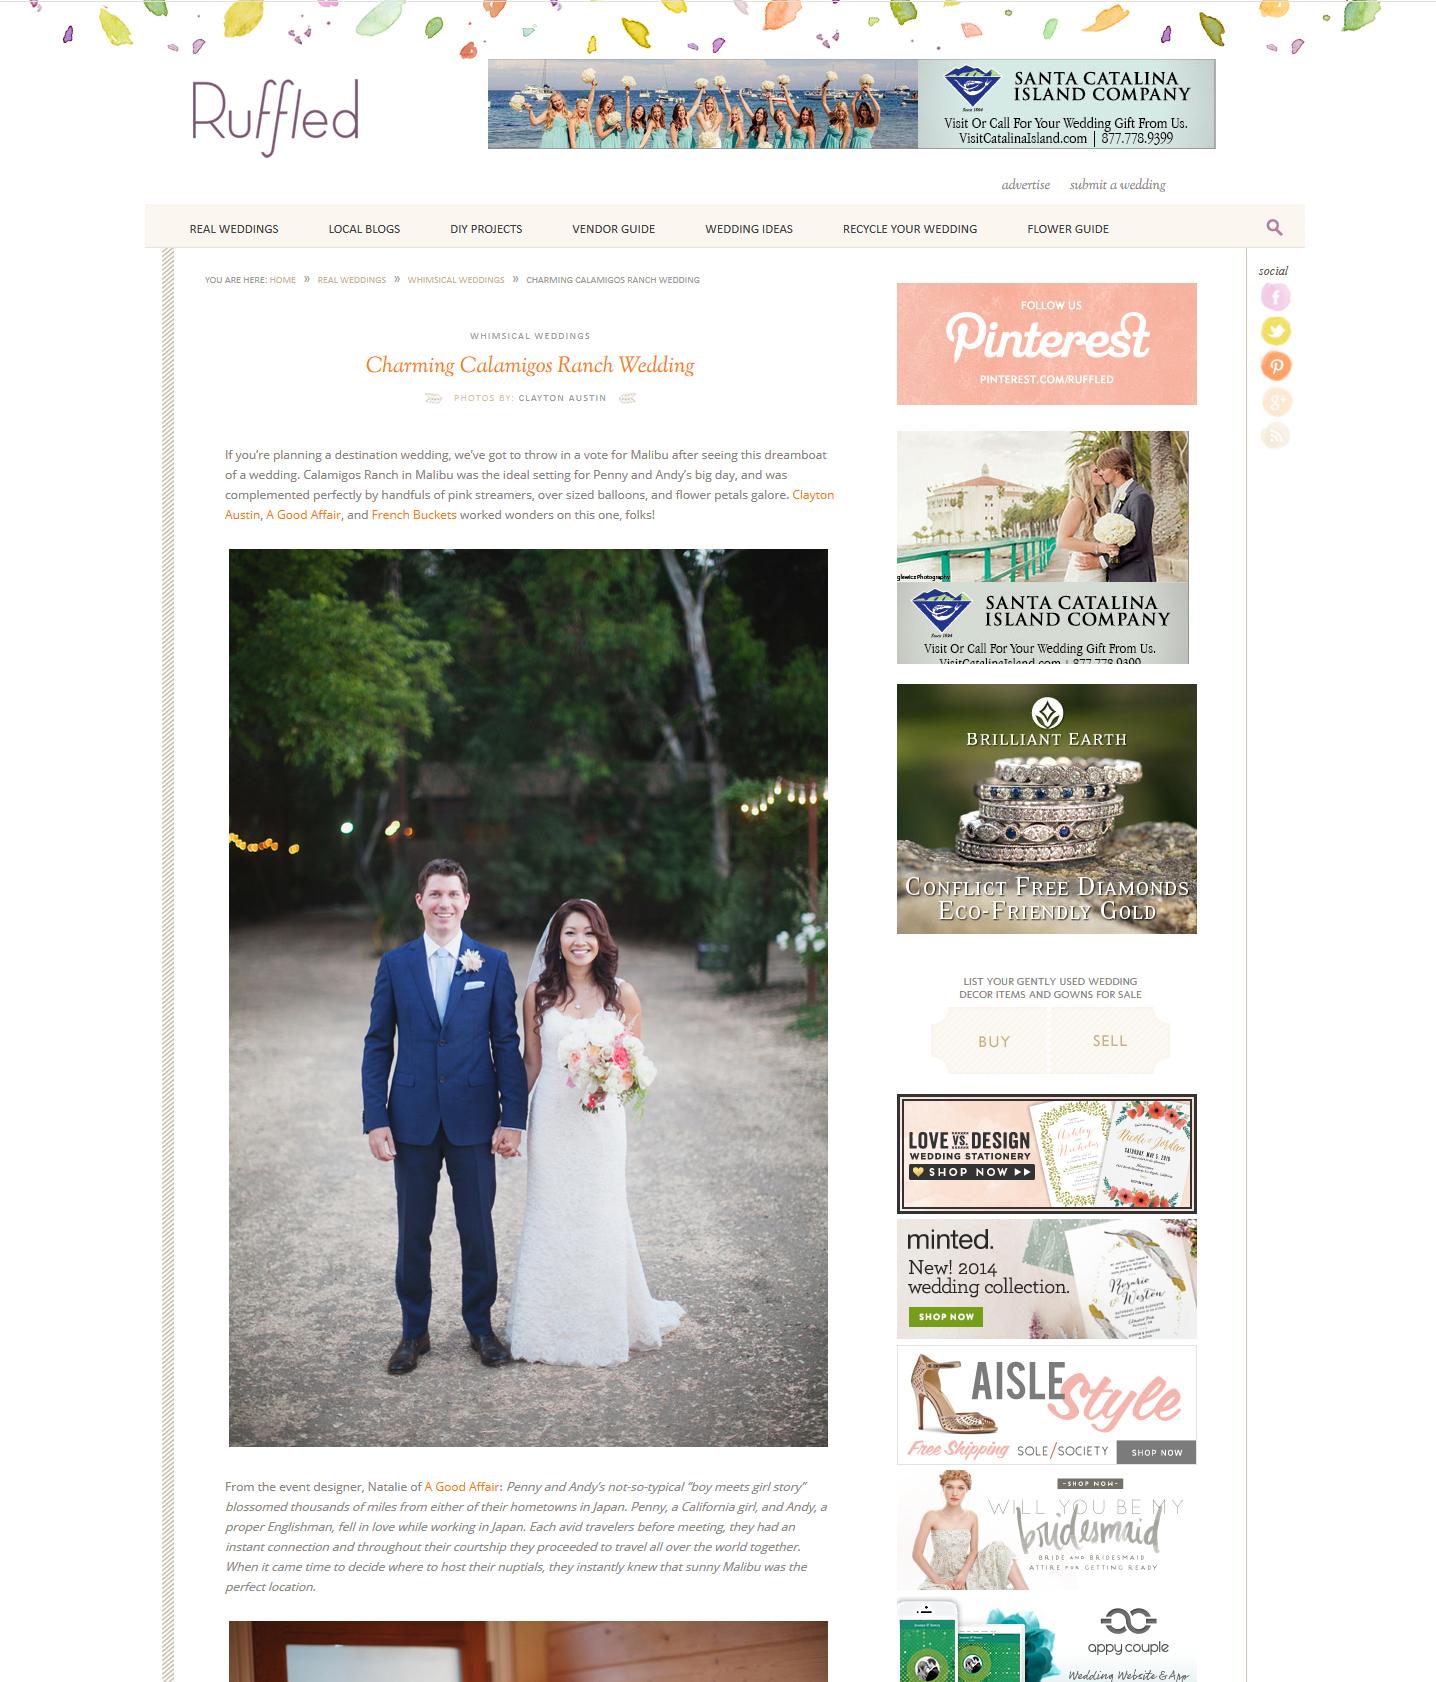 Ruffled Wedding Blog, Calamigos Ranch Wedding feature, Whimsical charming fun wedding, destination wedding, A Good Affair Wedding & Event Production